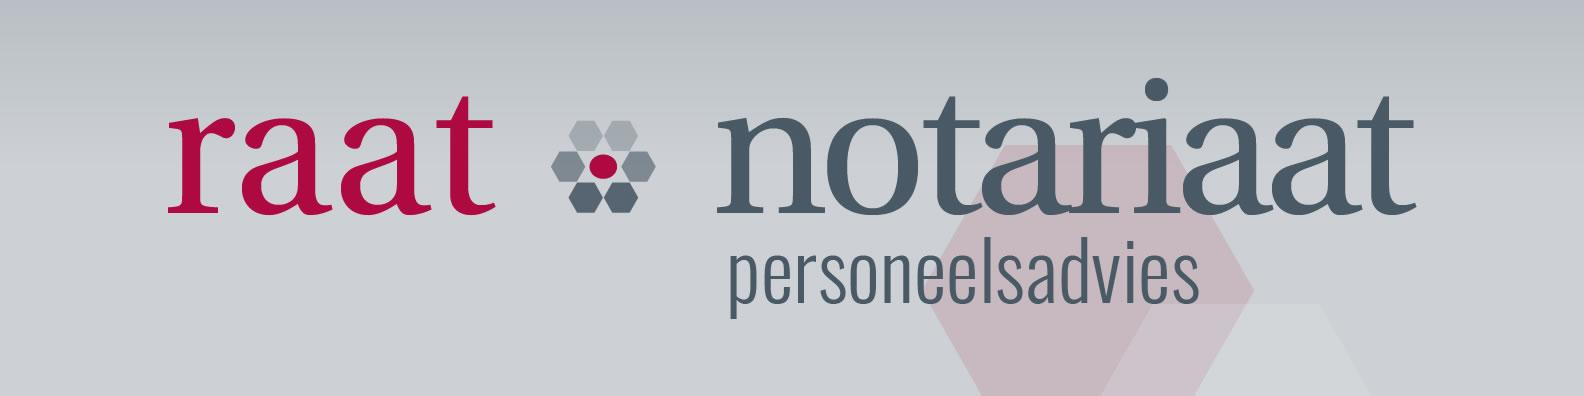 Kandidaat- notaris PFR Boedelpraktijk